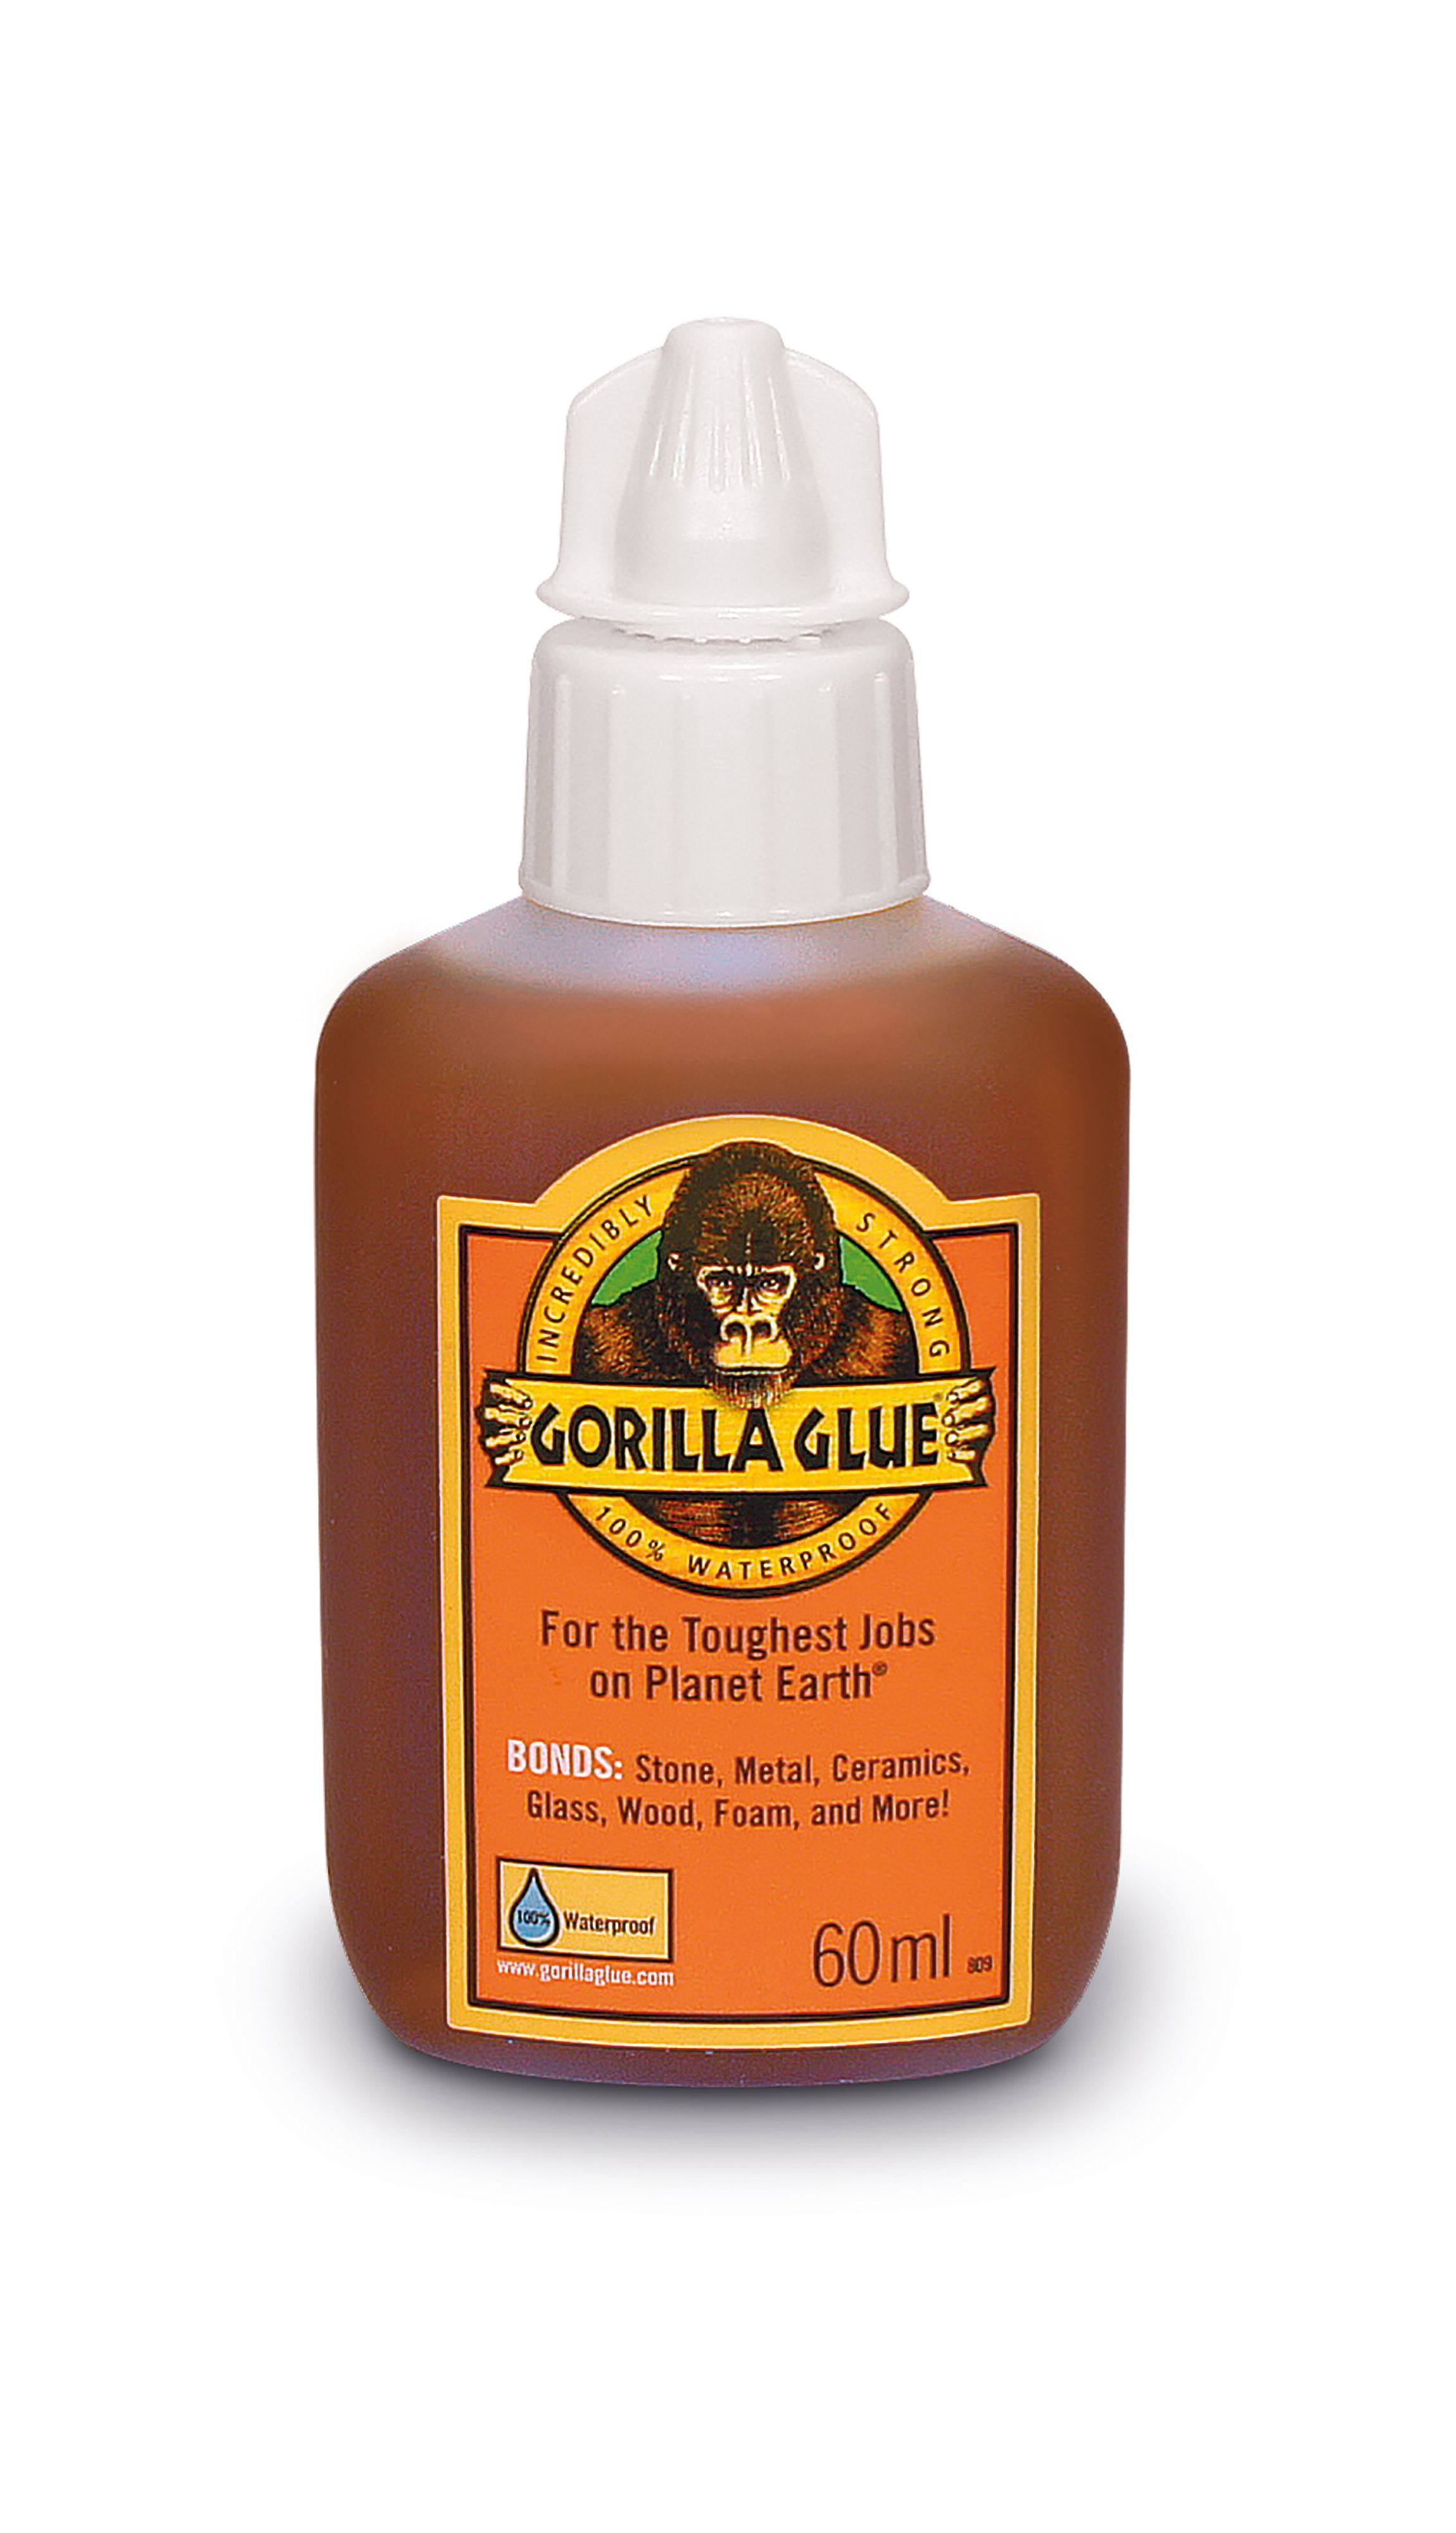 Gorilla Glue 60ml Departments Diy At Bq